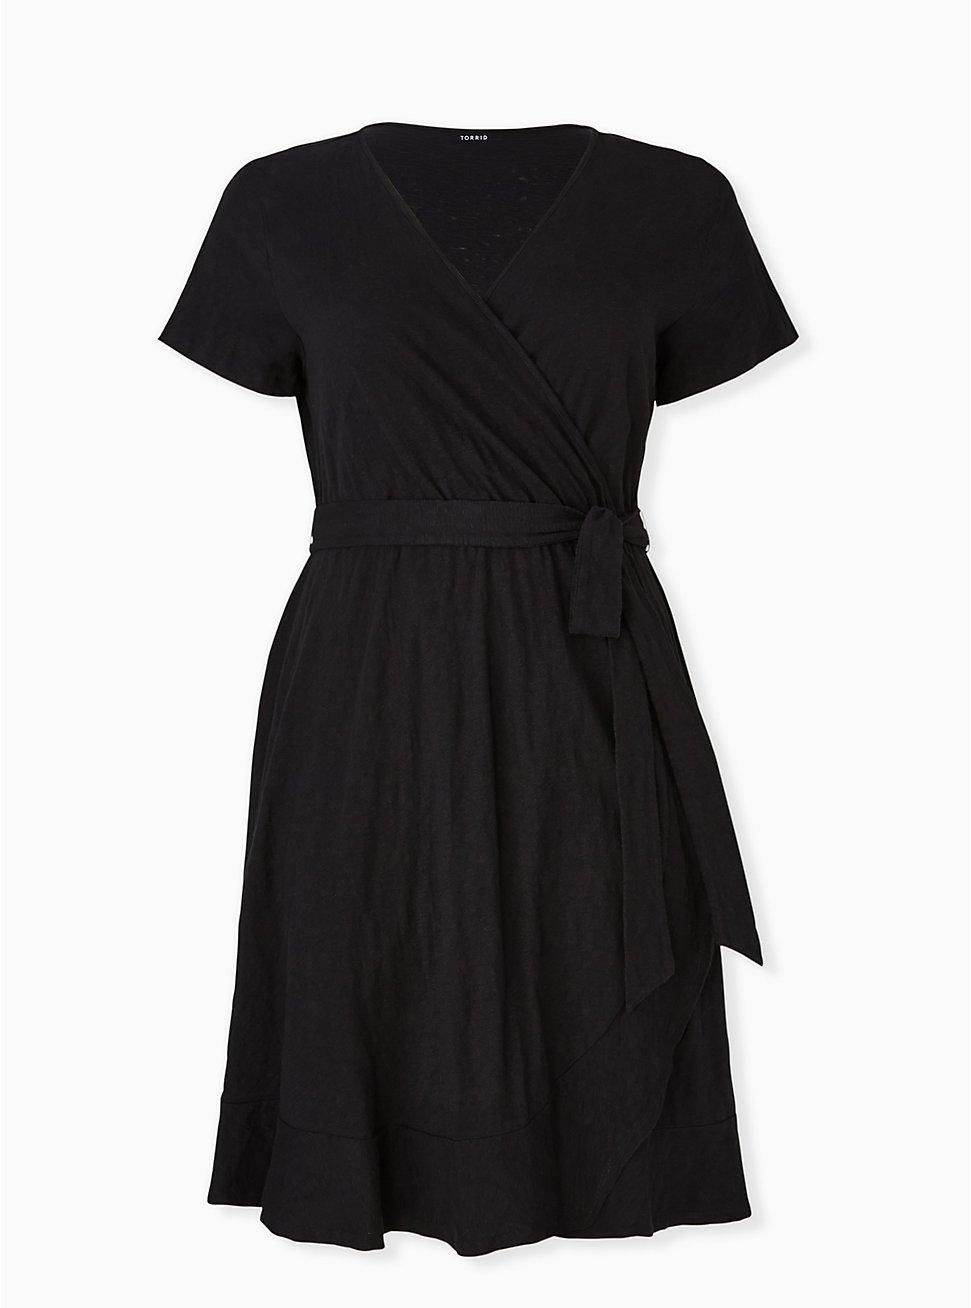 Plus Size Black Slub Jersey Ruffle Mini Wrap Dress, DEEP BLACK, hi-res